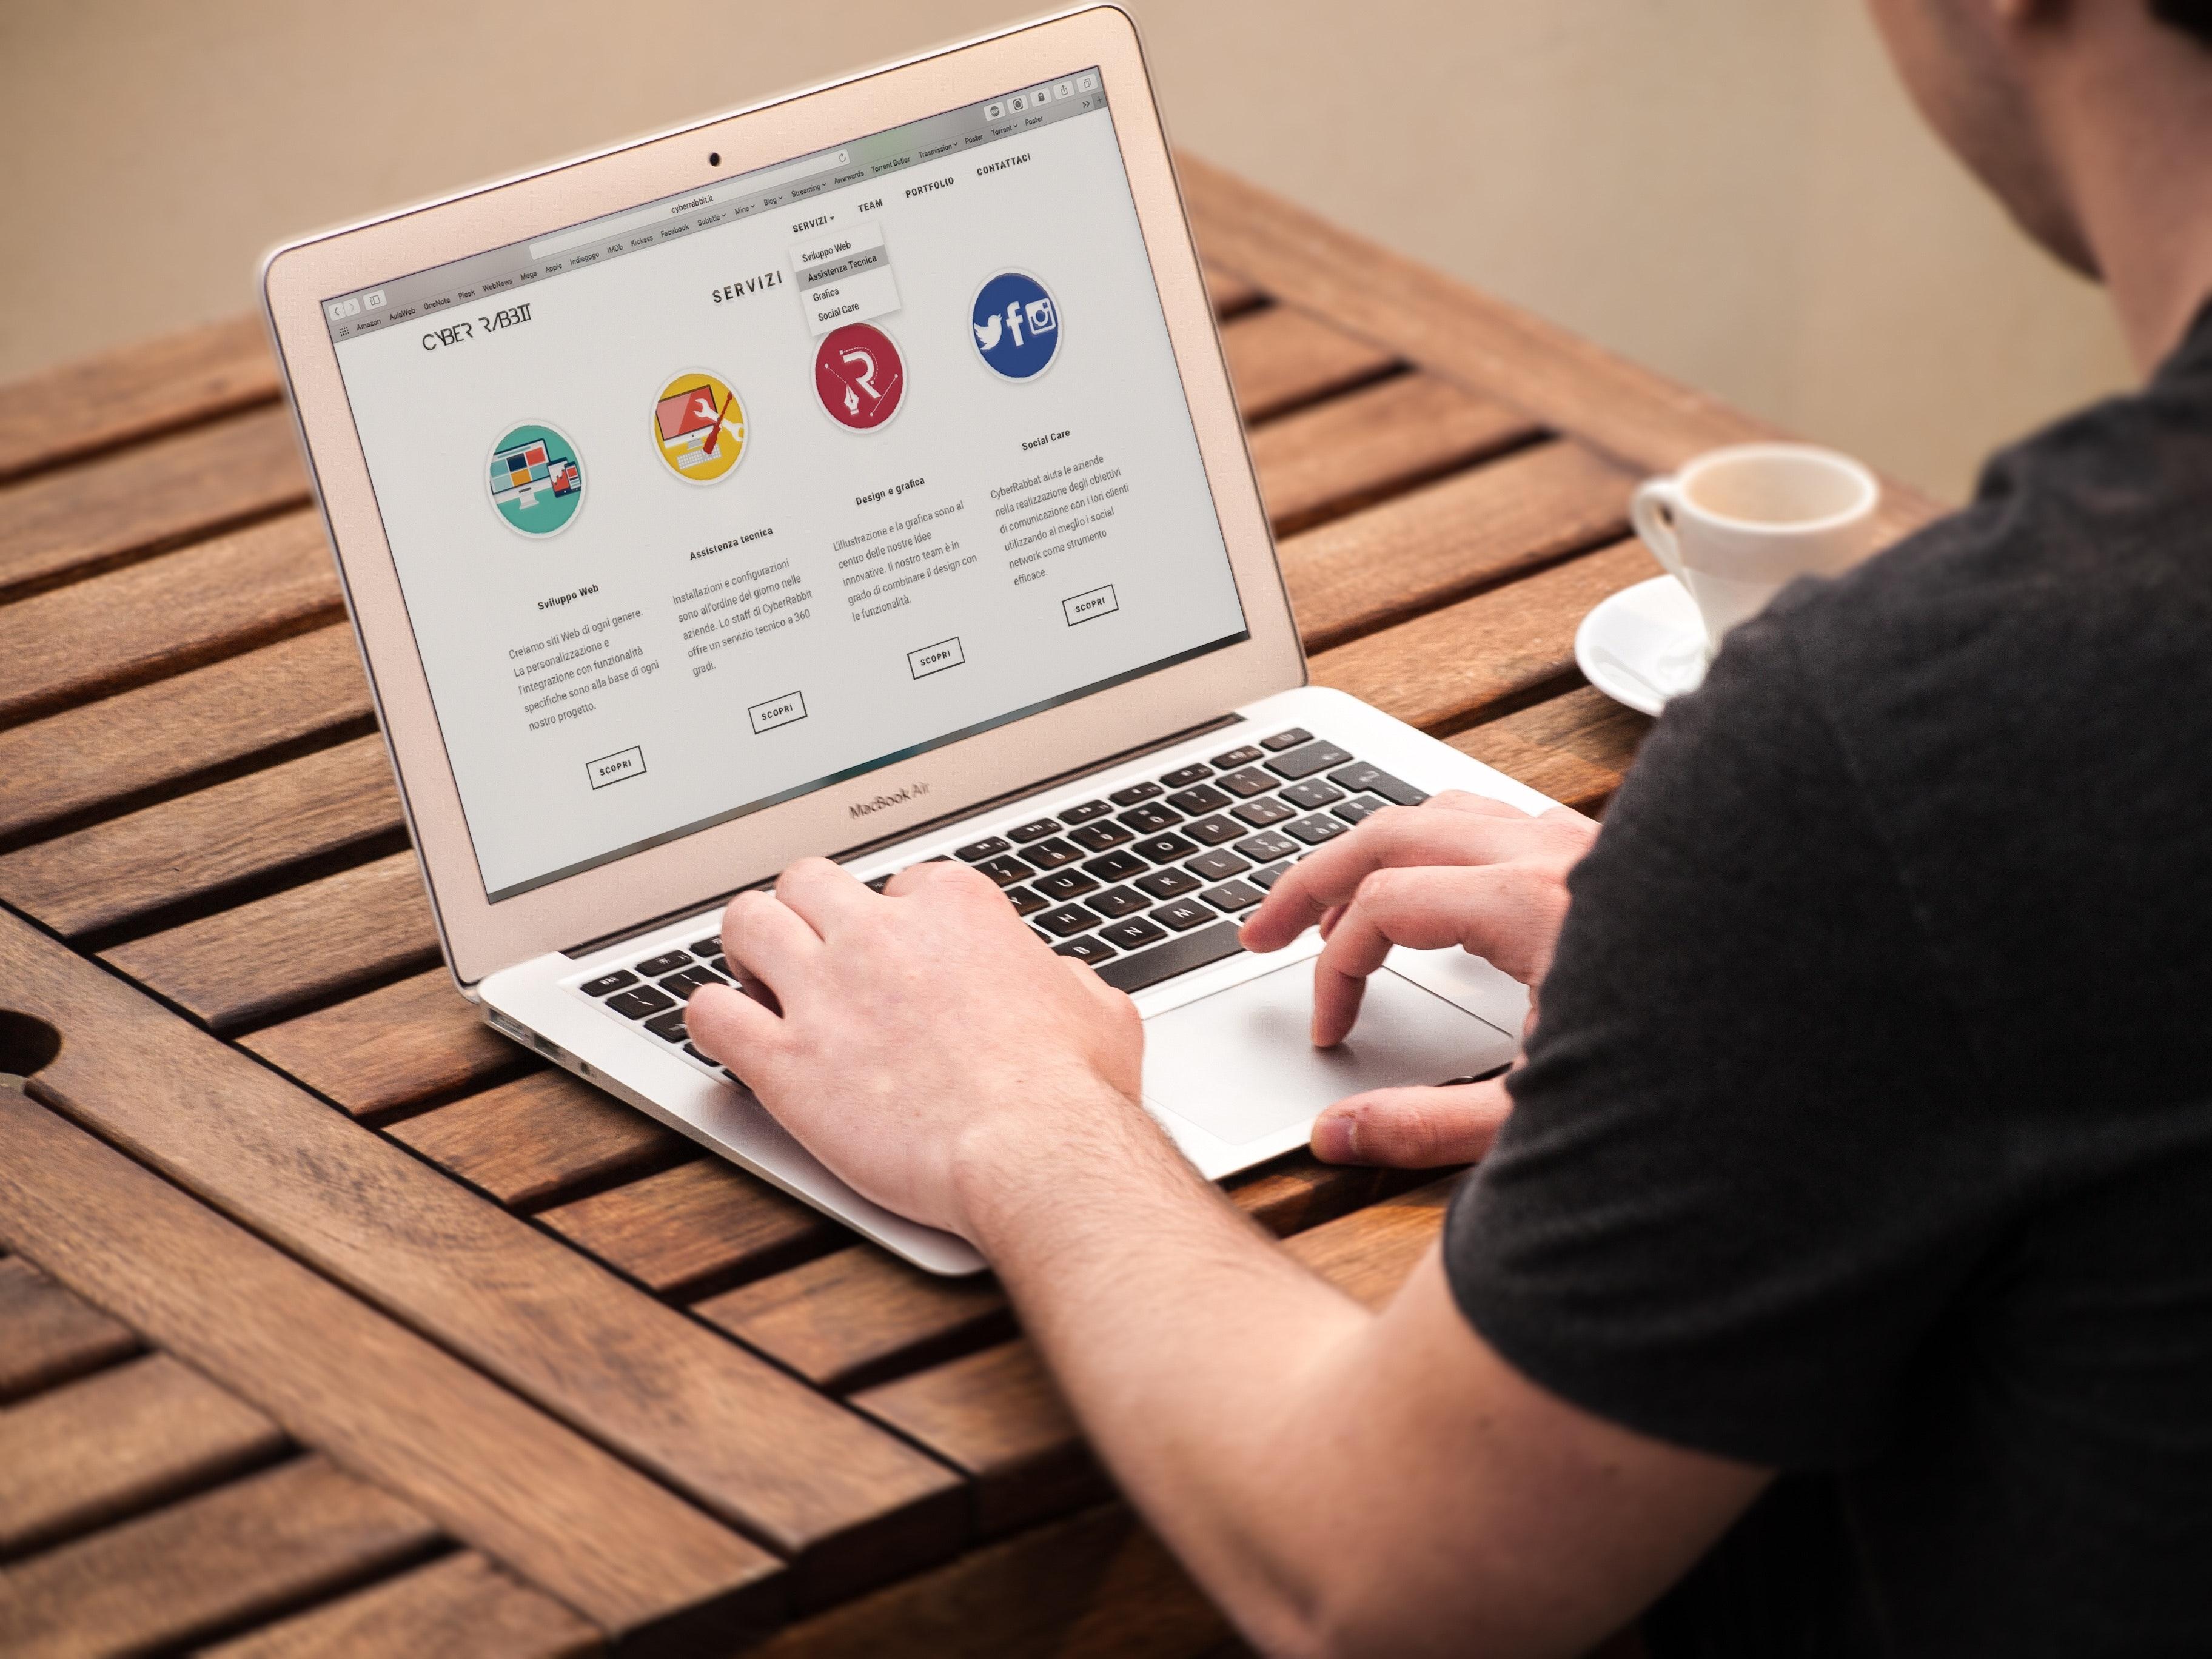 Como Ayuda Un Sitio Web A Mi Empresa?